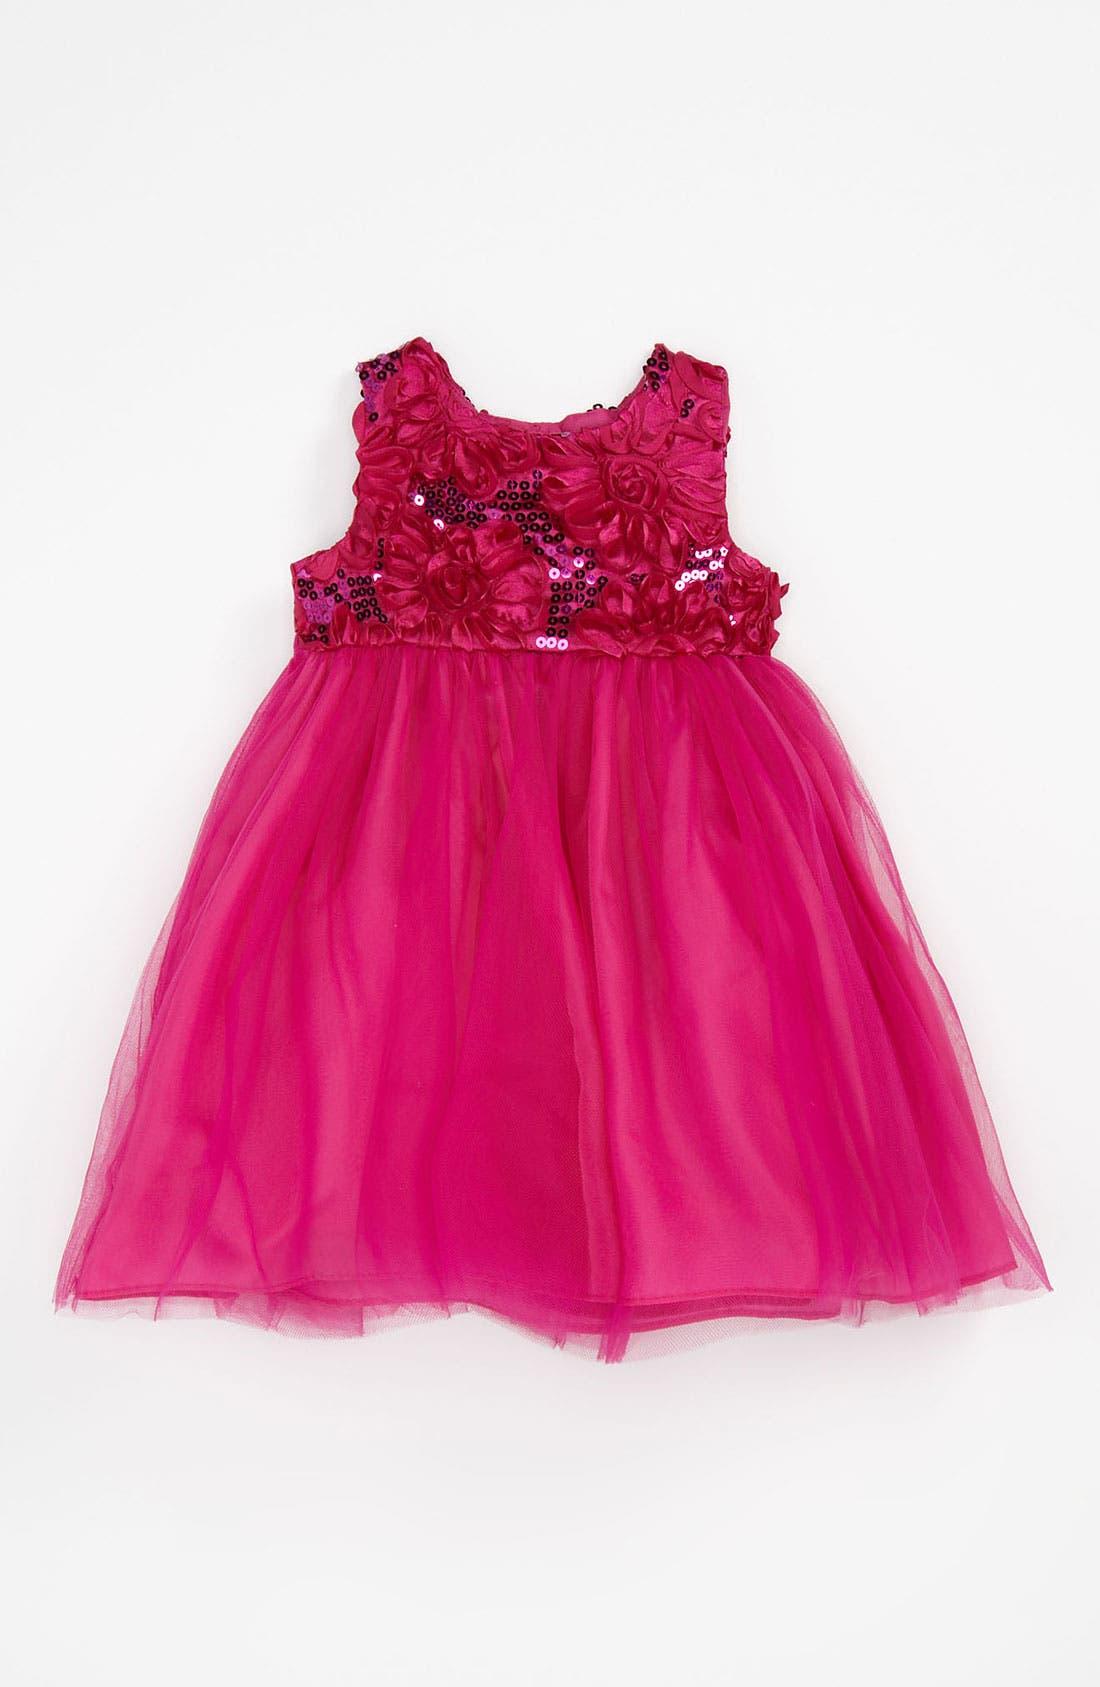 Alternate Image 1 Selected - Pippa & Julie Sequin Ballerina Dress (Toddler)